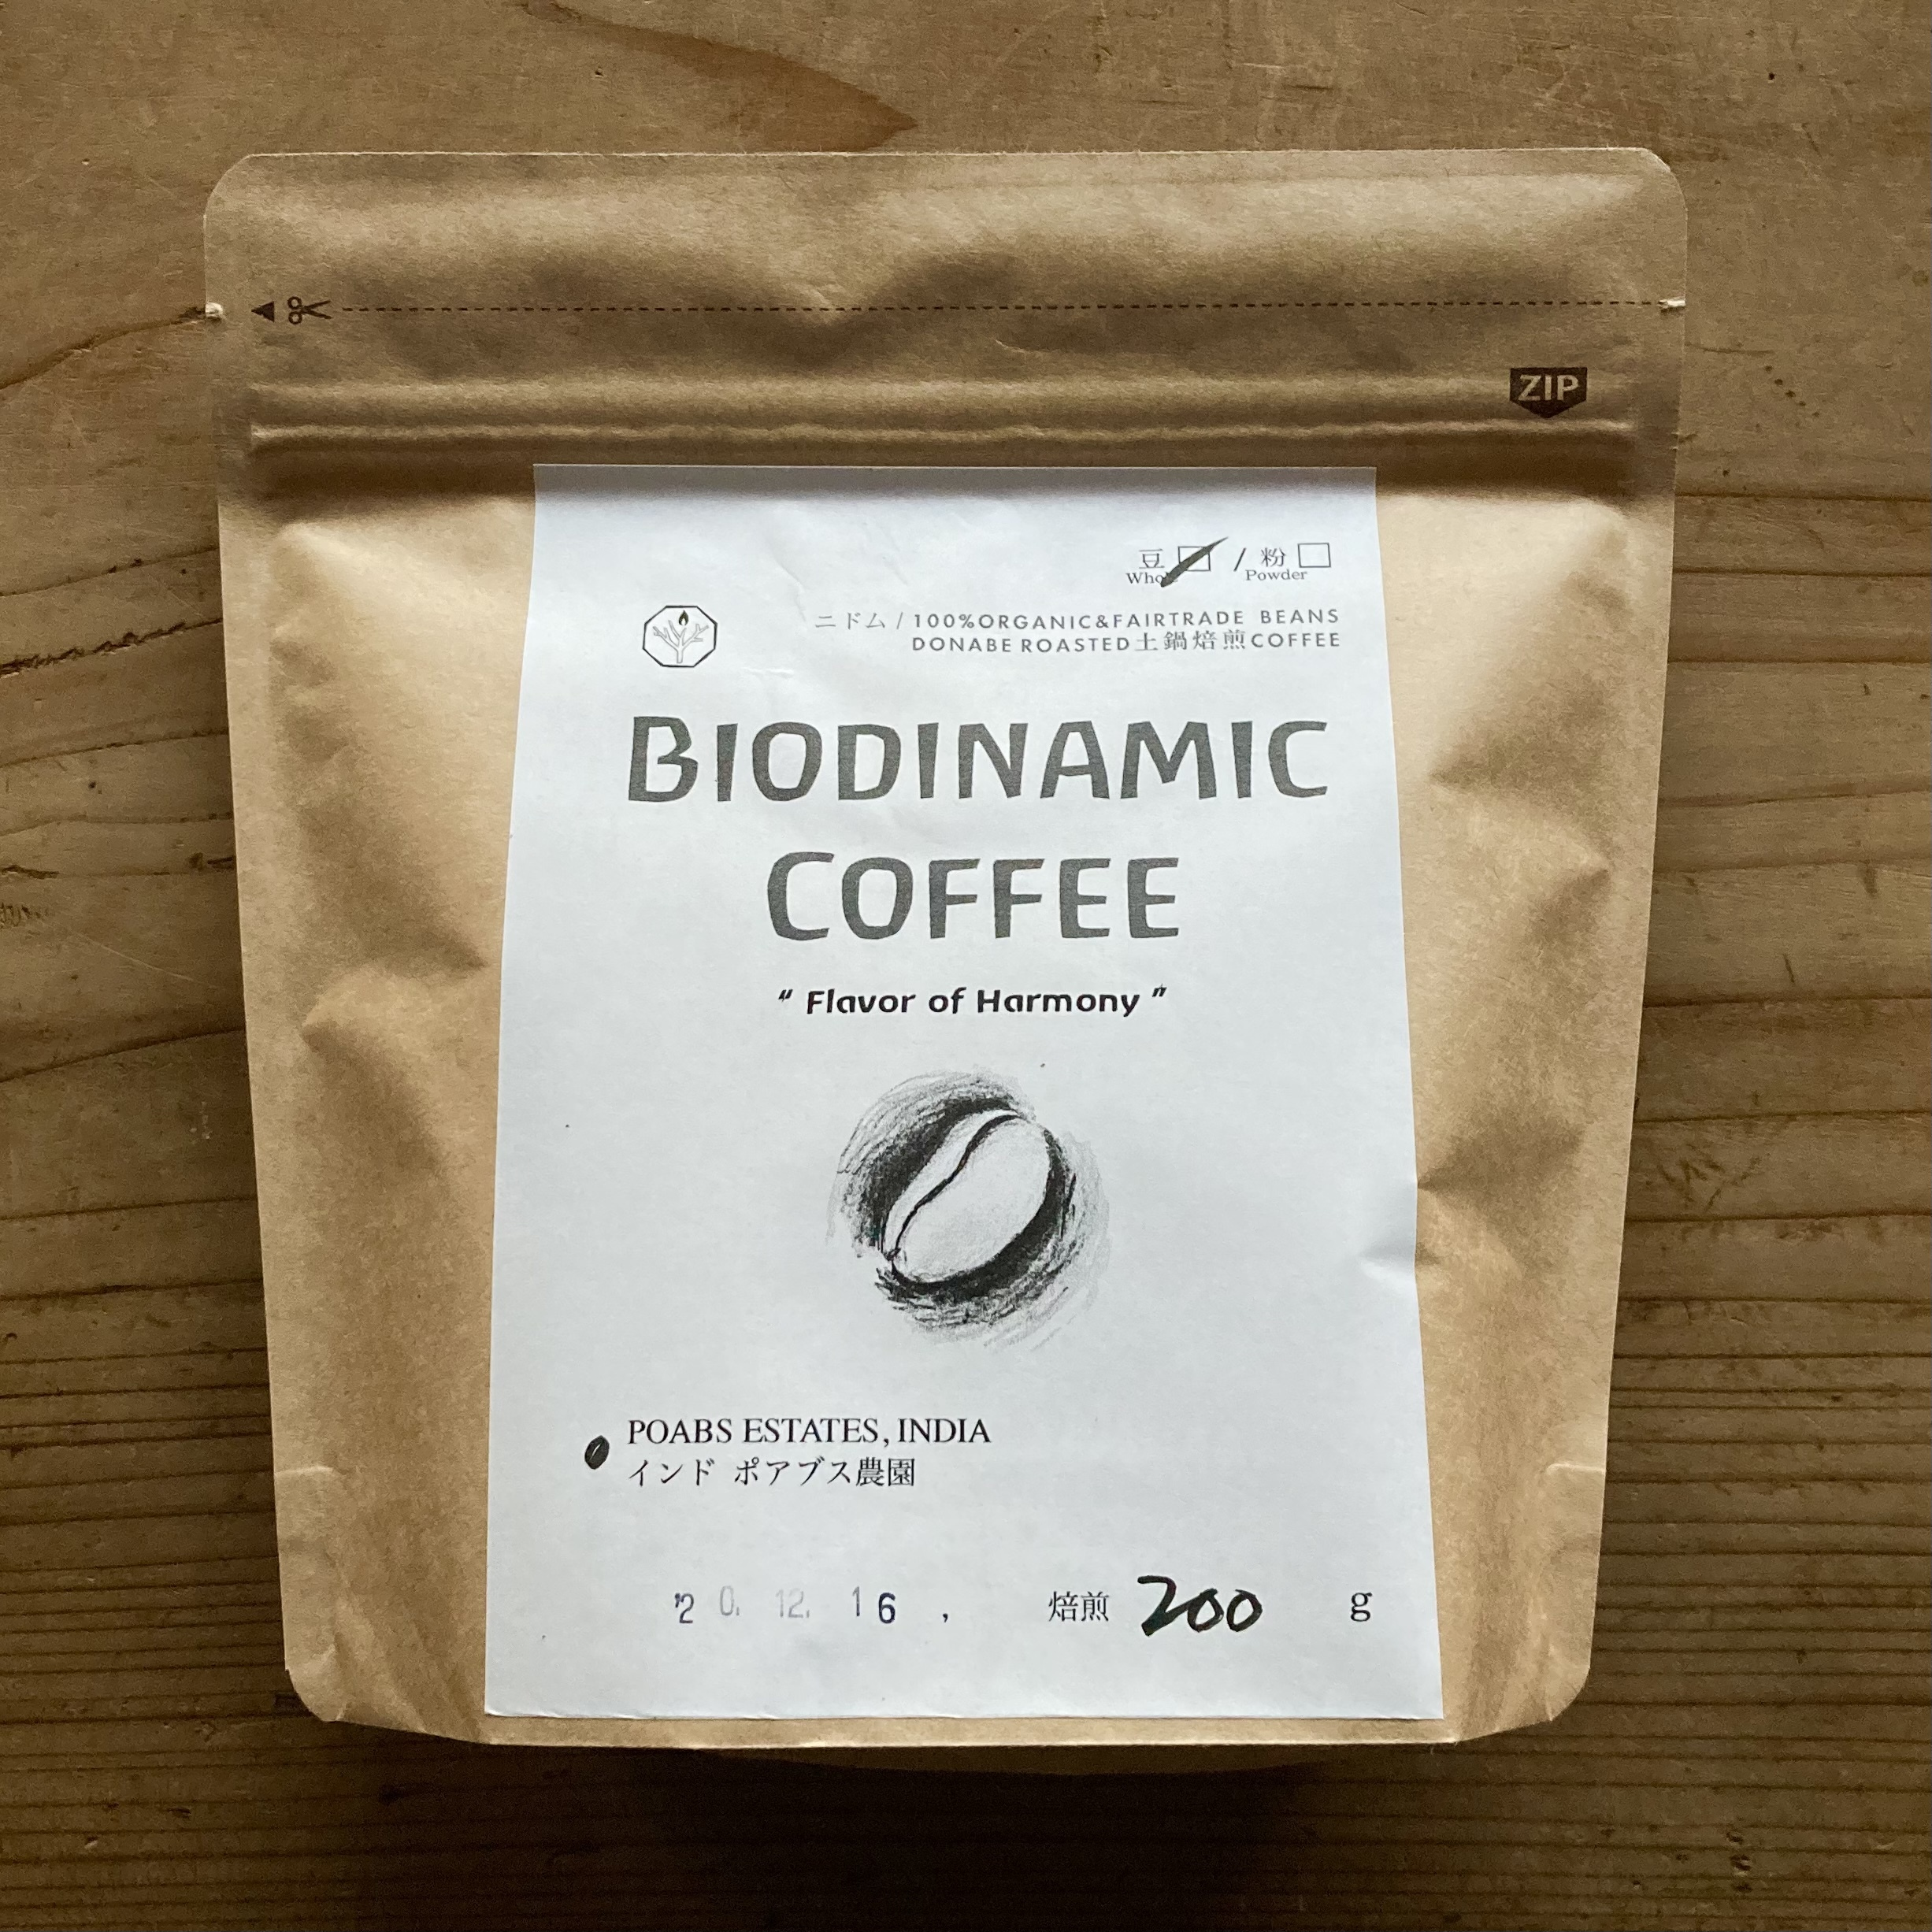 BIODINAMIC COFFEE 豆 200g - 画像1